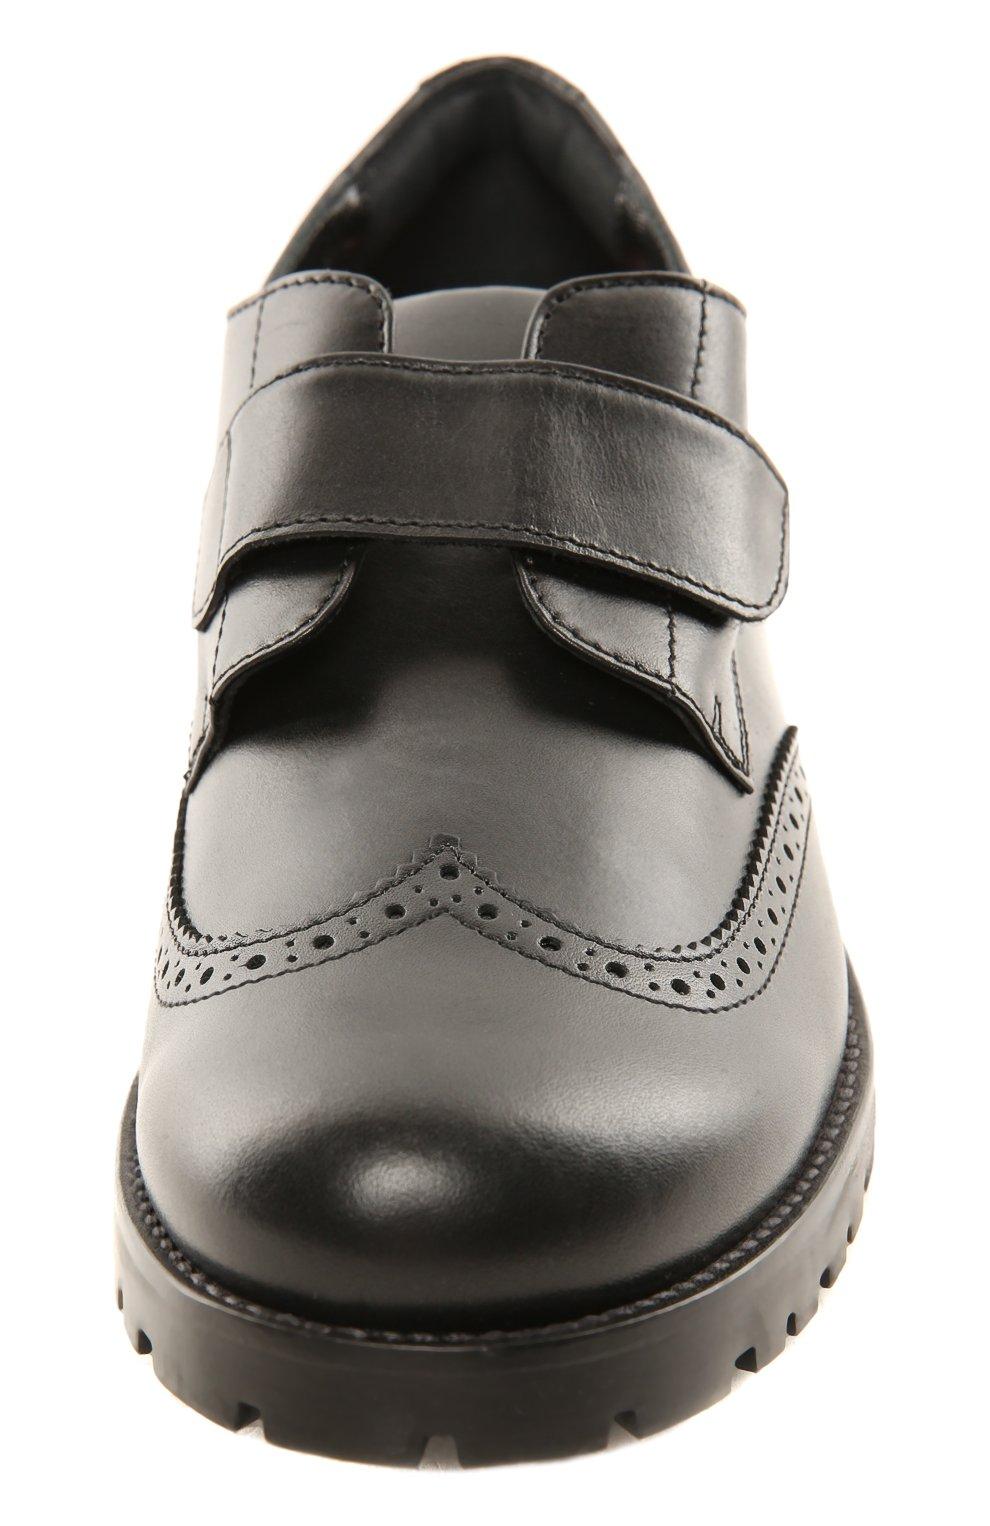 Ботинки | Фото №4